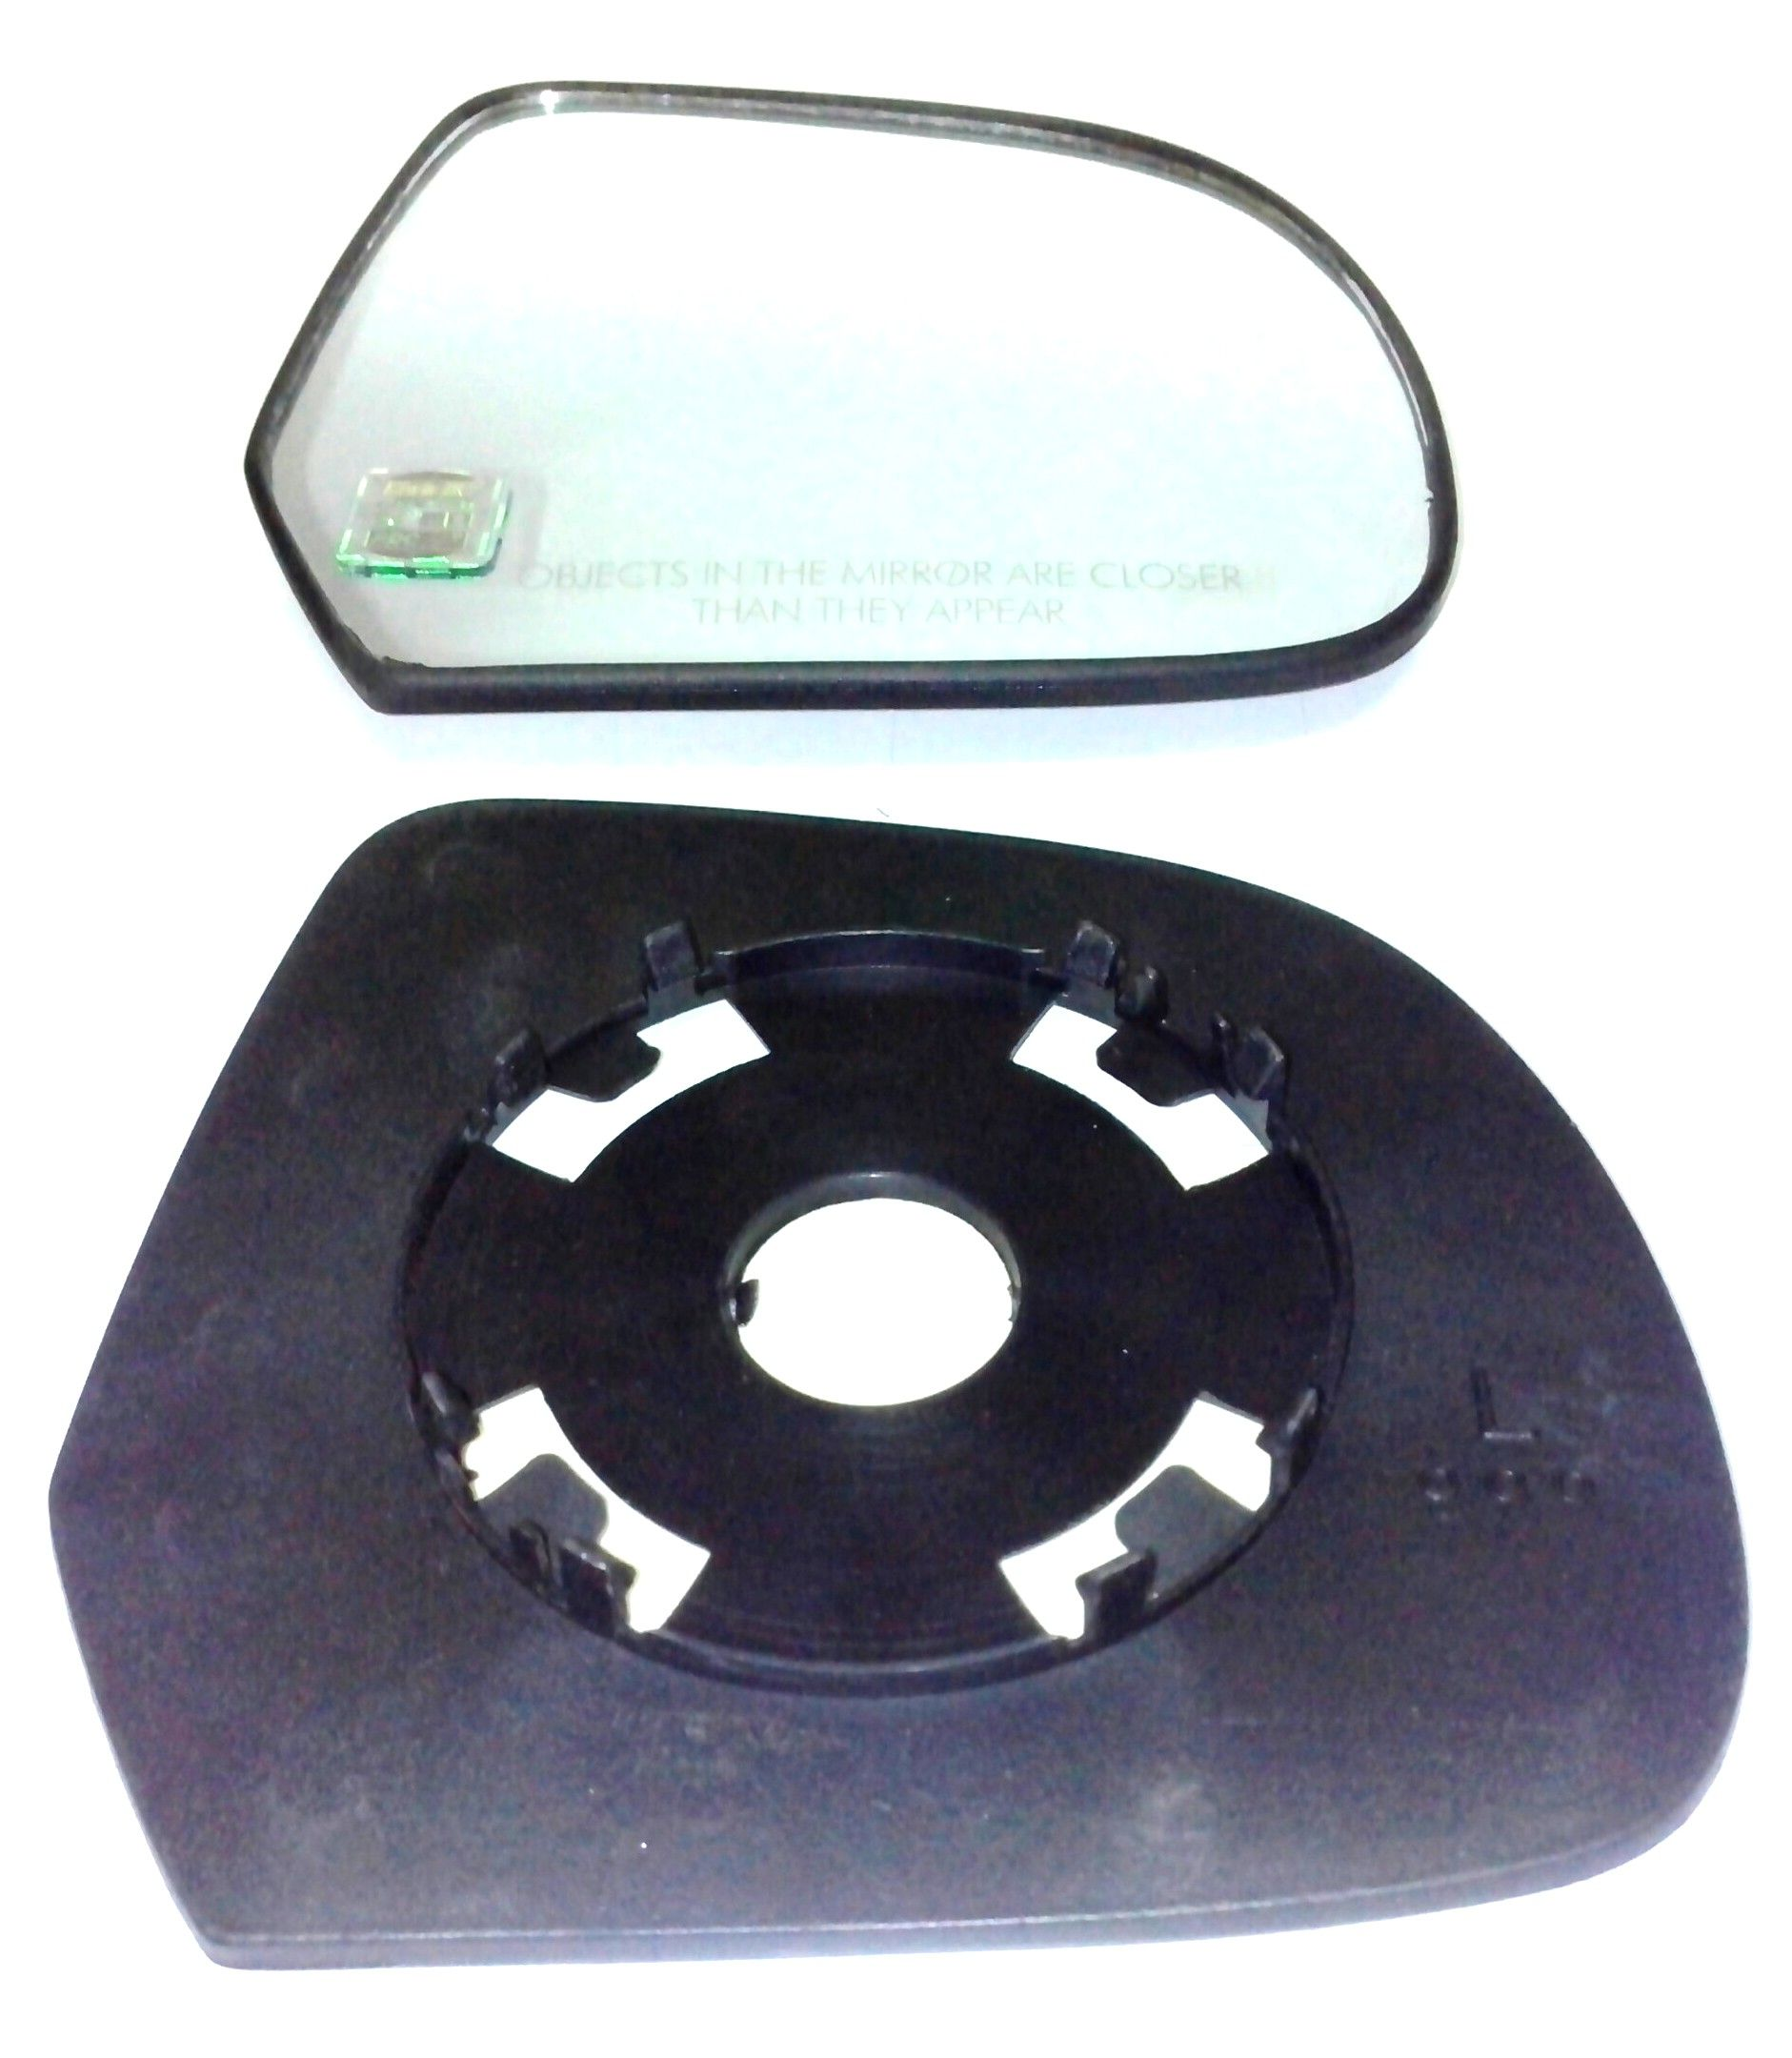 MANTRA-CONVEX MIRROR PLATES (SUB MIRROR PLATES) FOR TATA INDICA T-1 LEFT SIDE